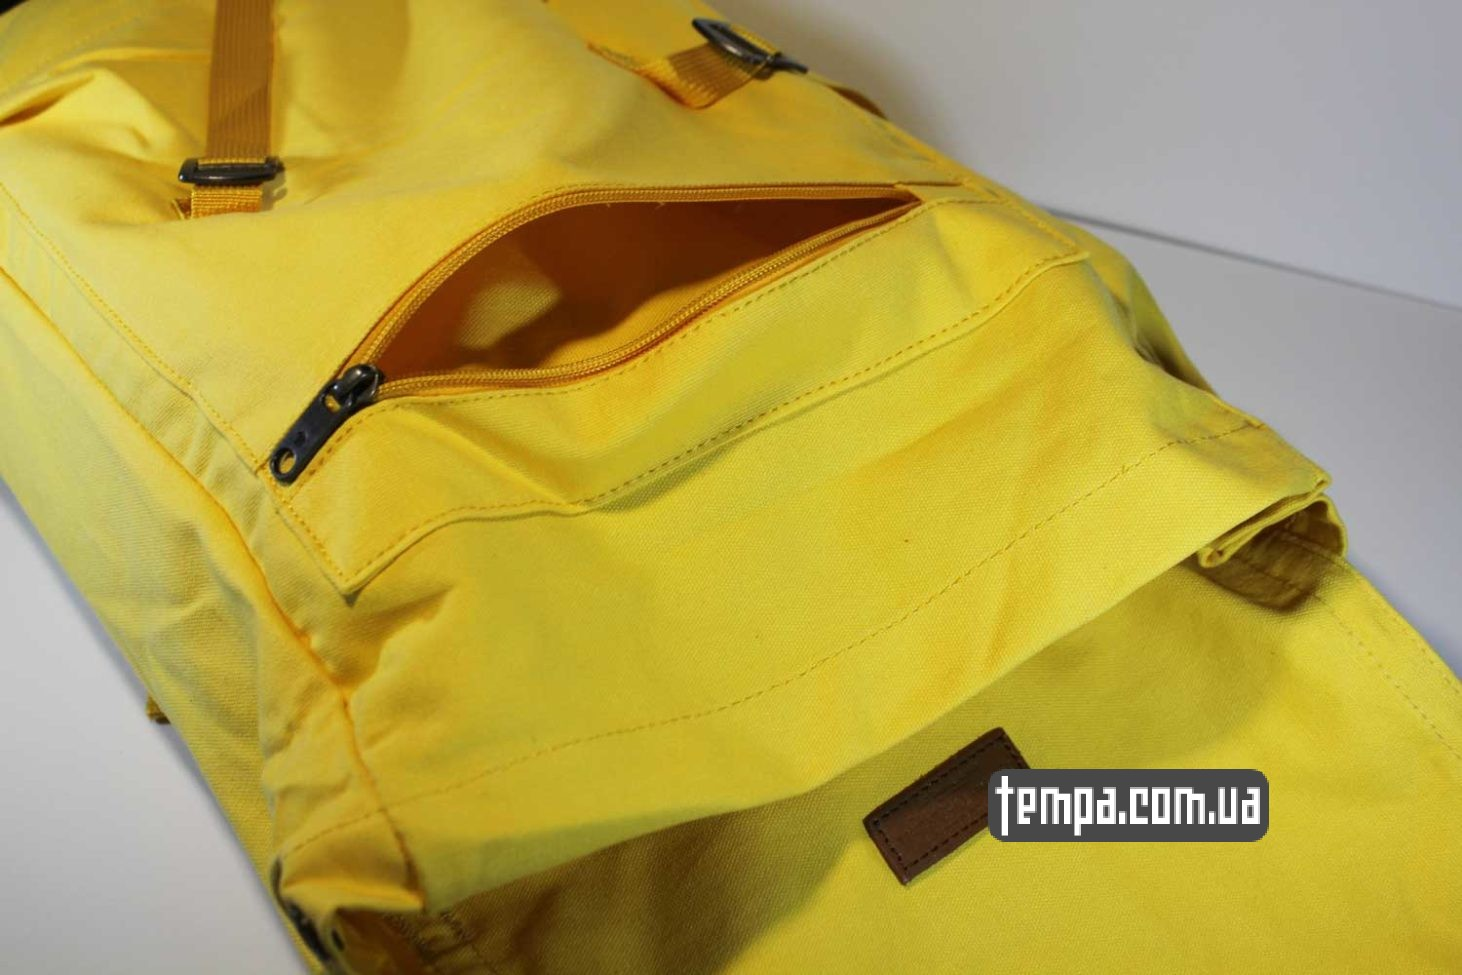 yellow рюкзак сумка G-1000 FOLDSACK NO.1 fjallraven kanken желтый